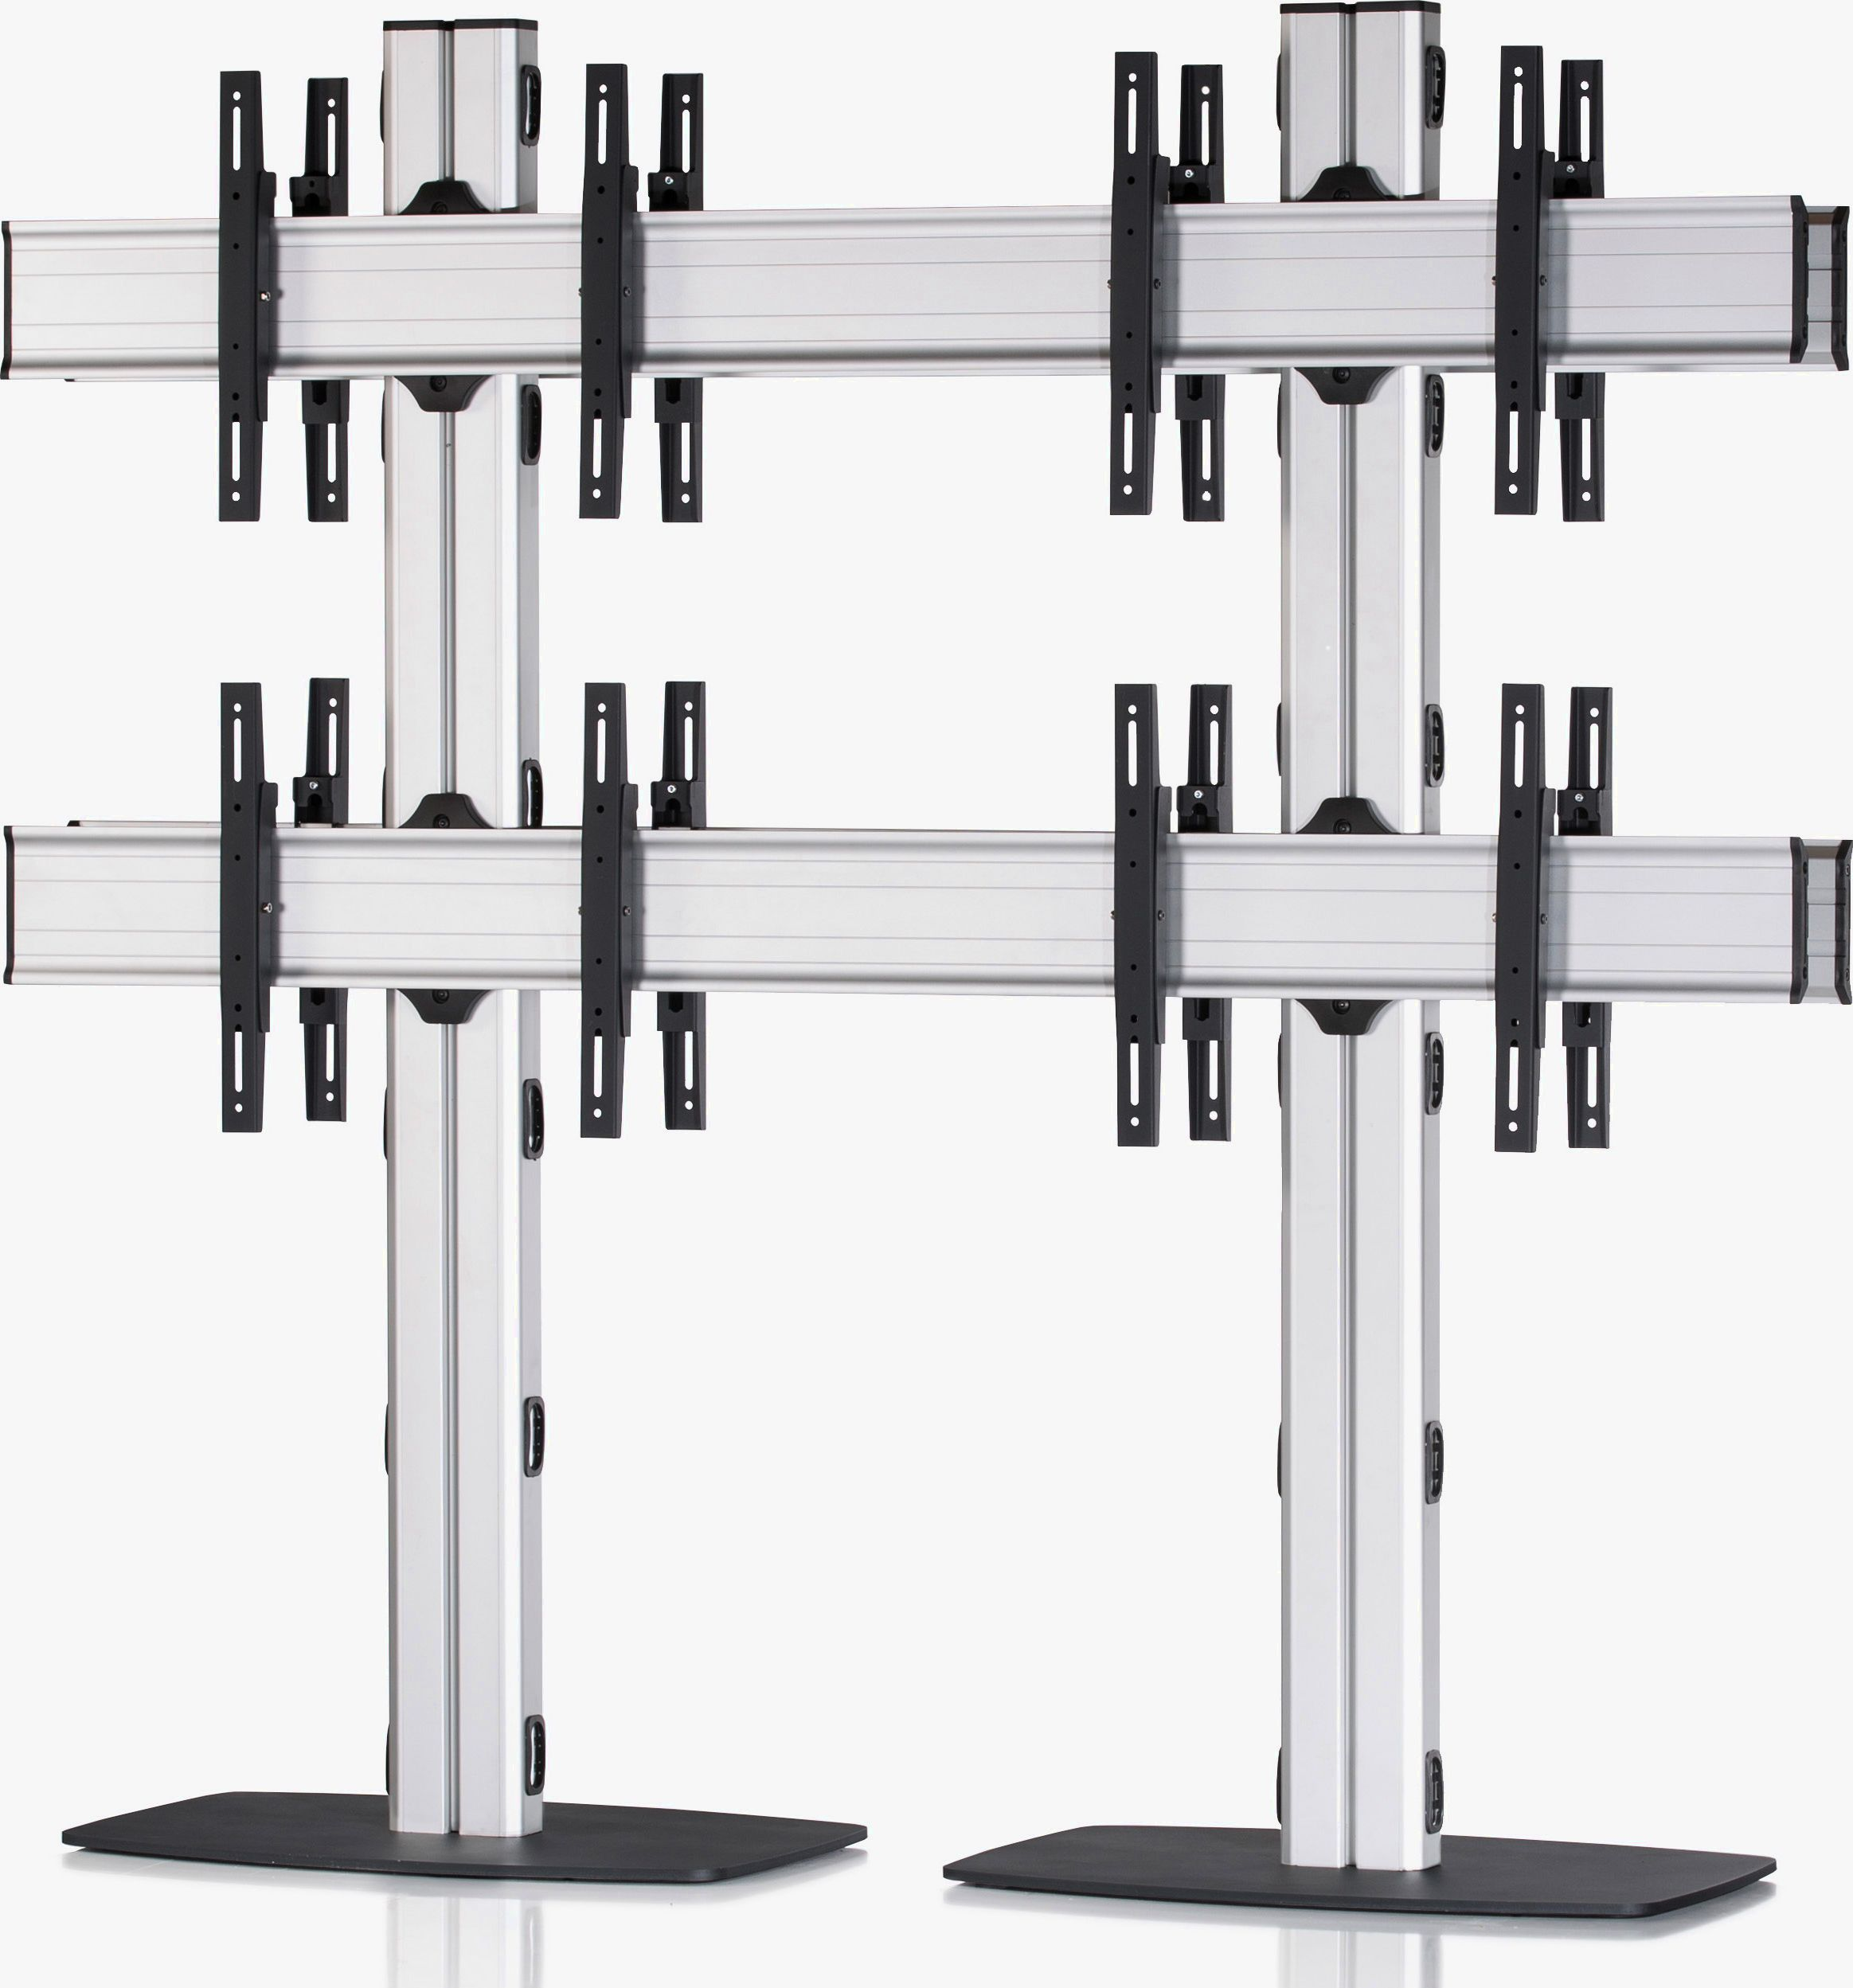 8 Displays 2x2 beidseitig, Standard-VESA, mit Standfuß